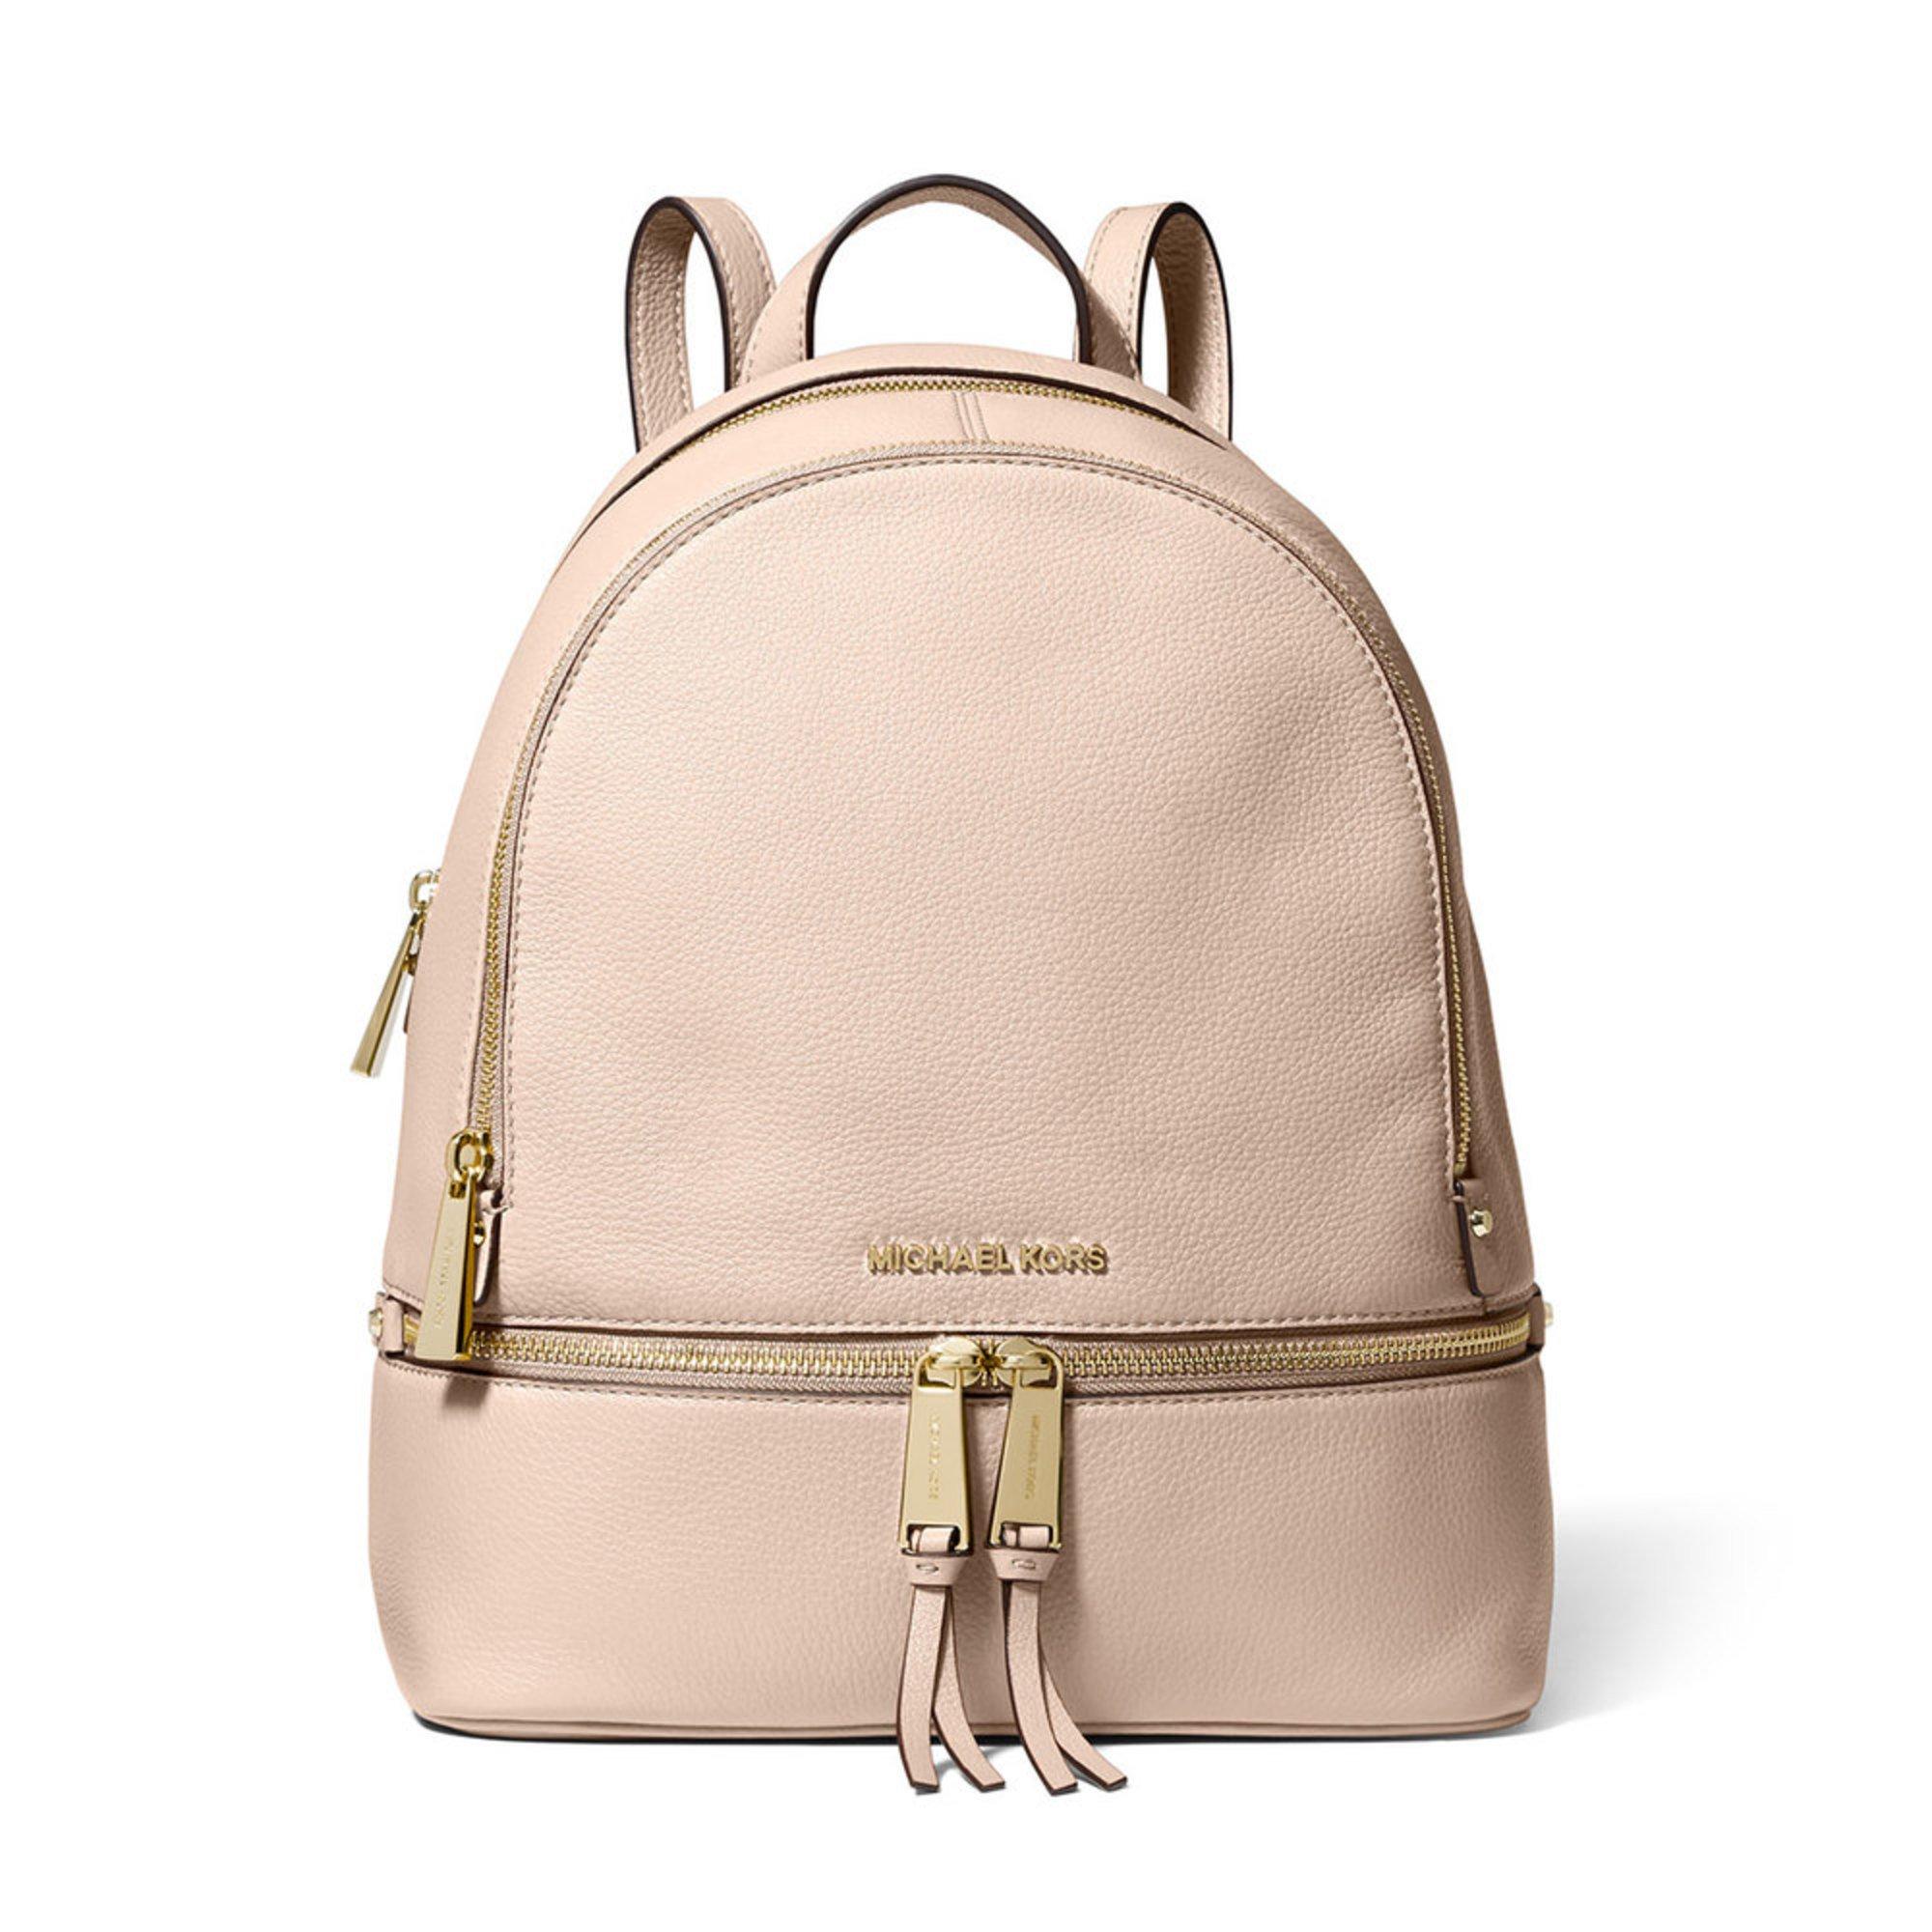 3b6994c5dc3723 Michael Kors Rhea Zip Medium Backpack Soft Pink | Women's Backpacks ...